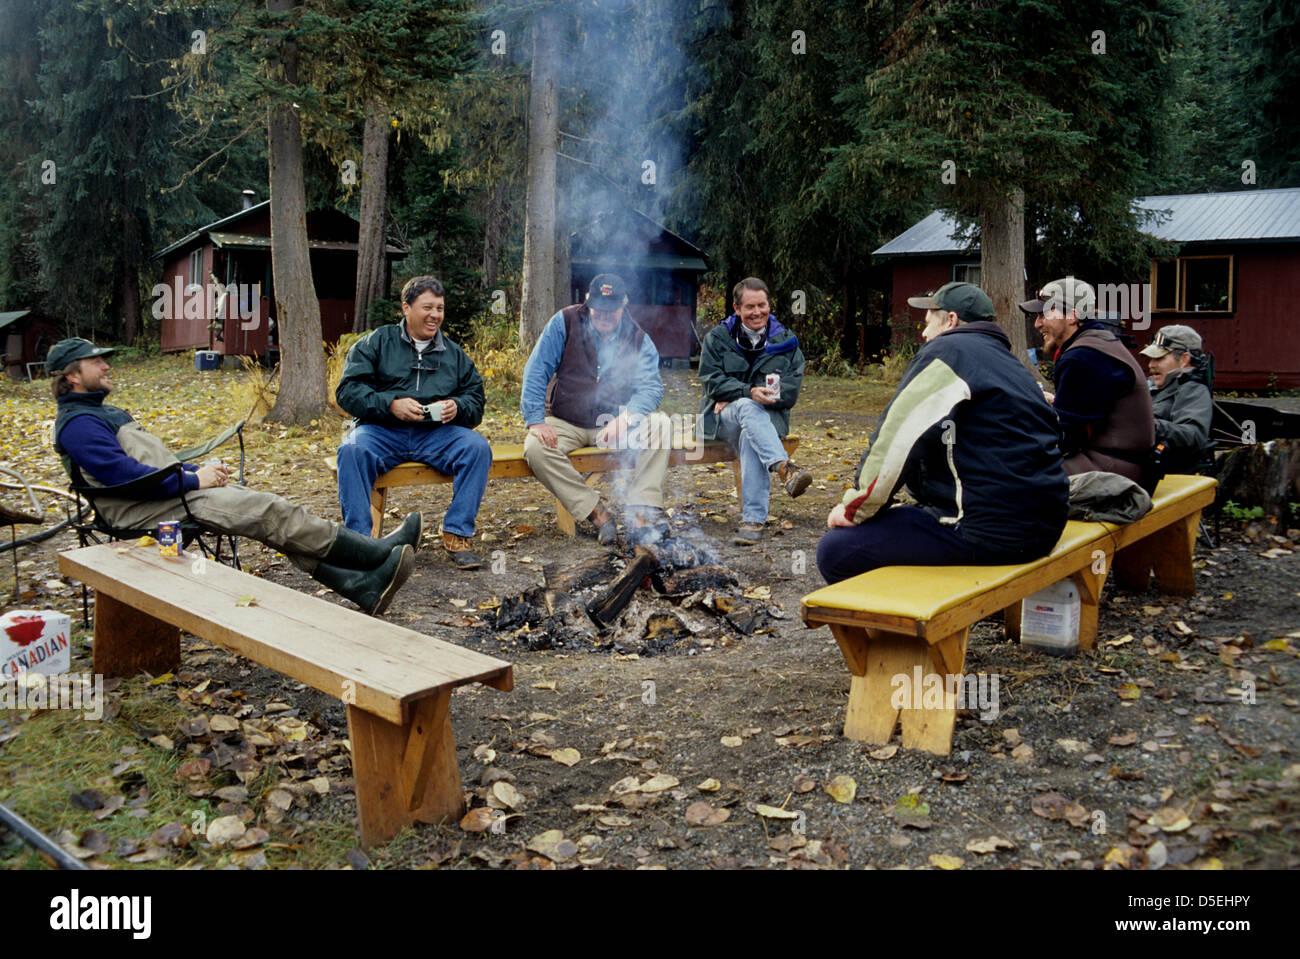 steelhead fly fishermen sitting around a campfire at a fishing lodge